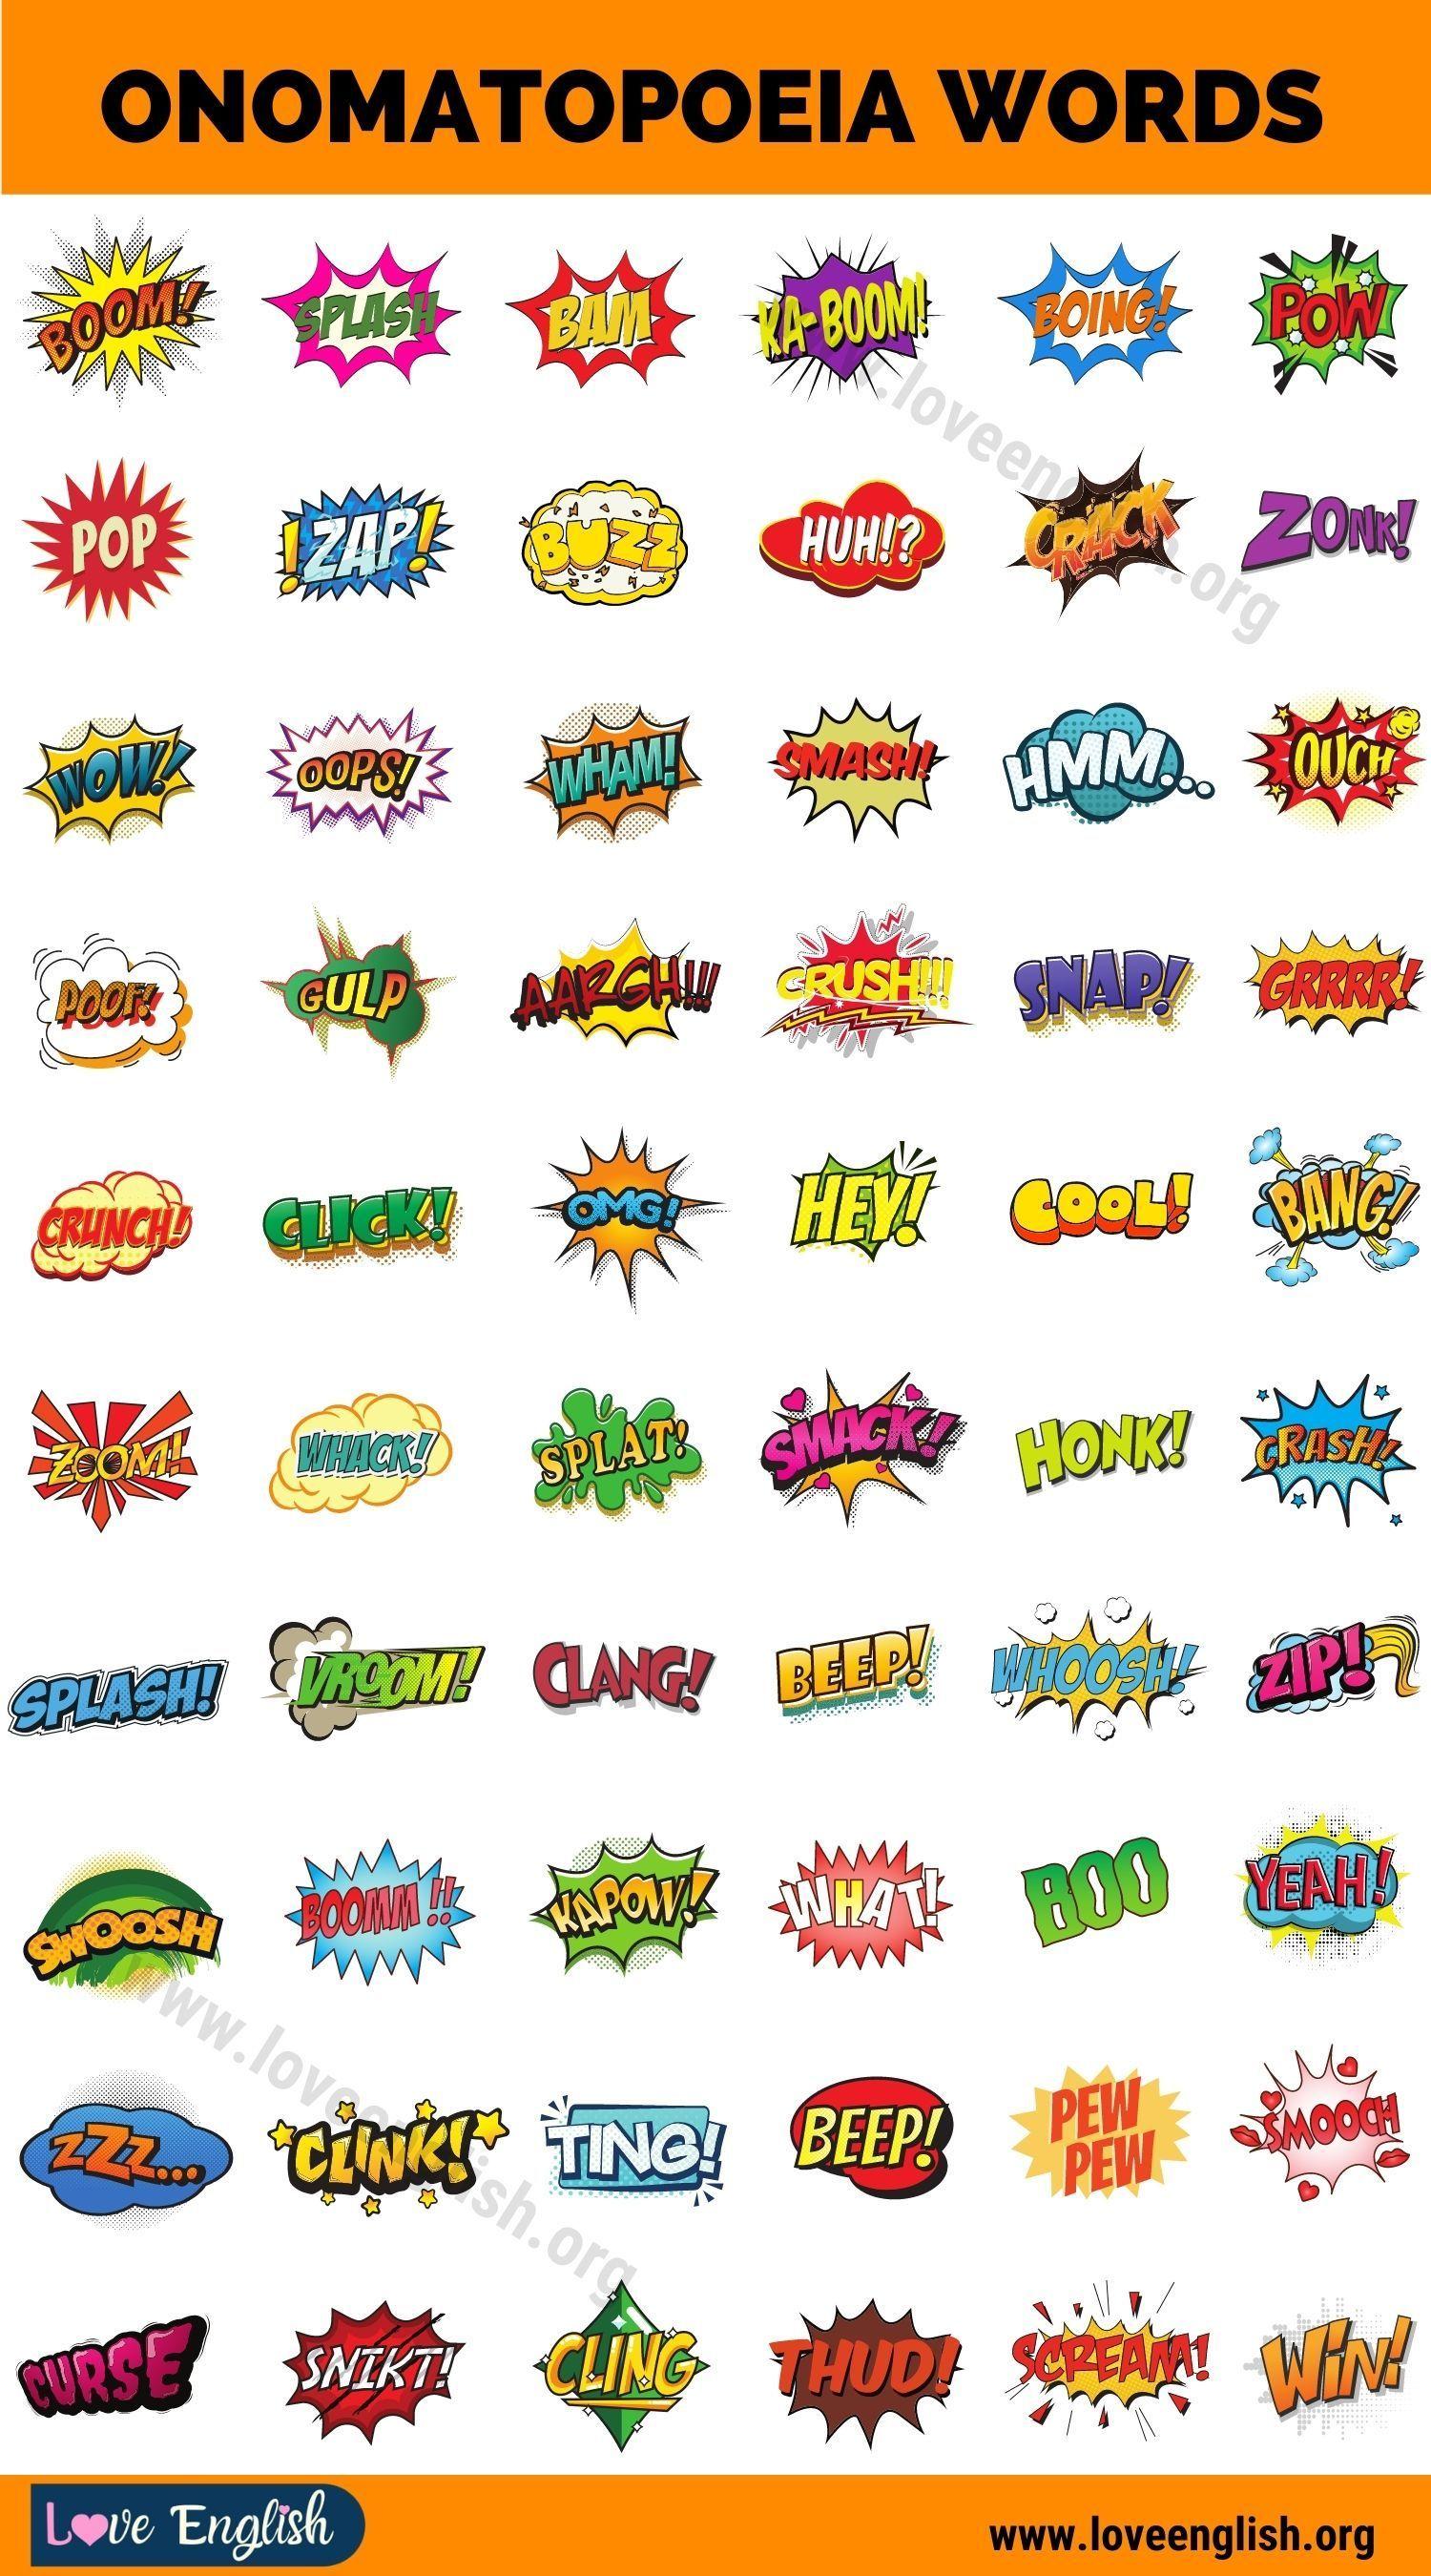 Onomatopoeia Wonderful List Of 120 Words That Describe